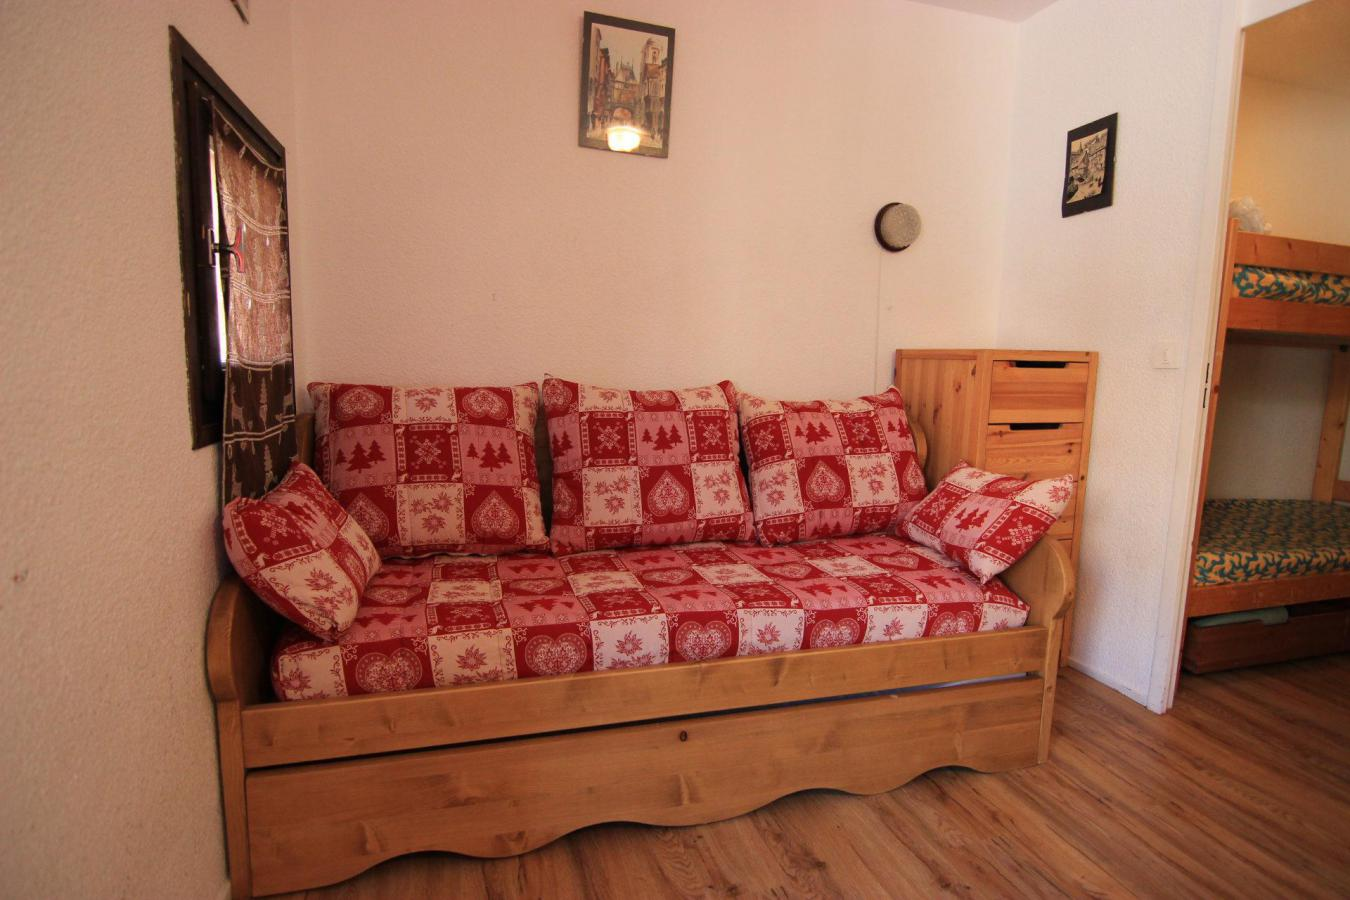 Location au ski Studio 2 personnes (156) - Residence Roche Blanche - Val Thorens - Table